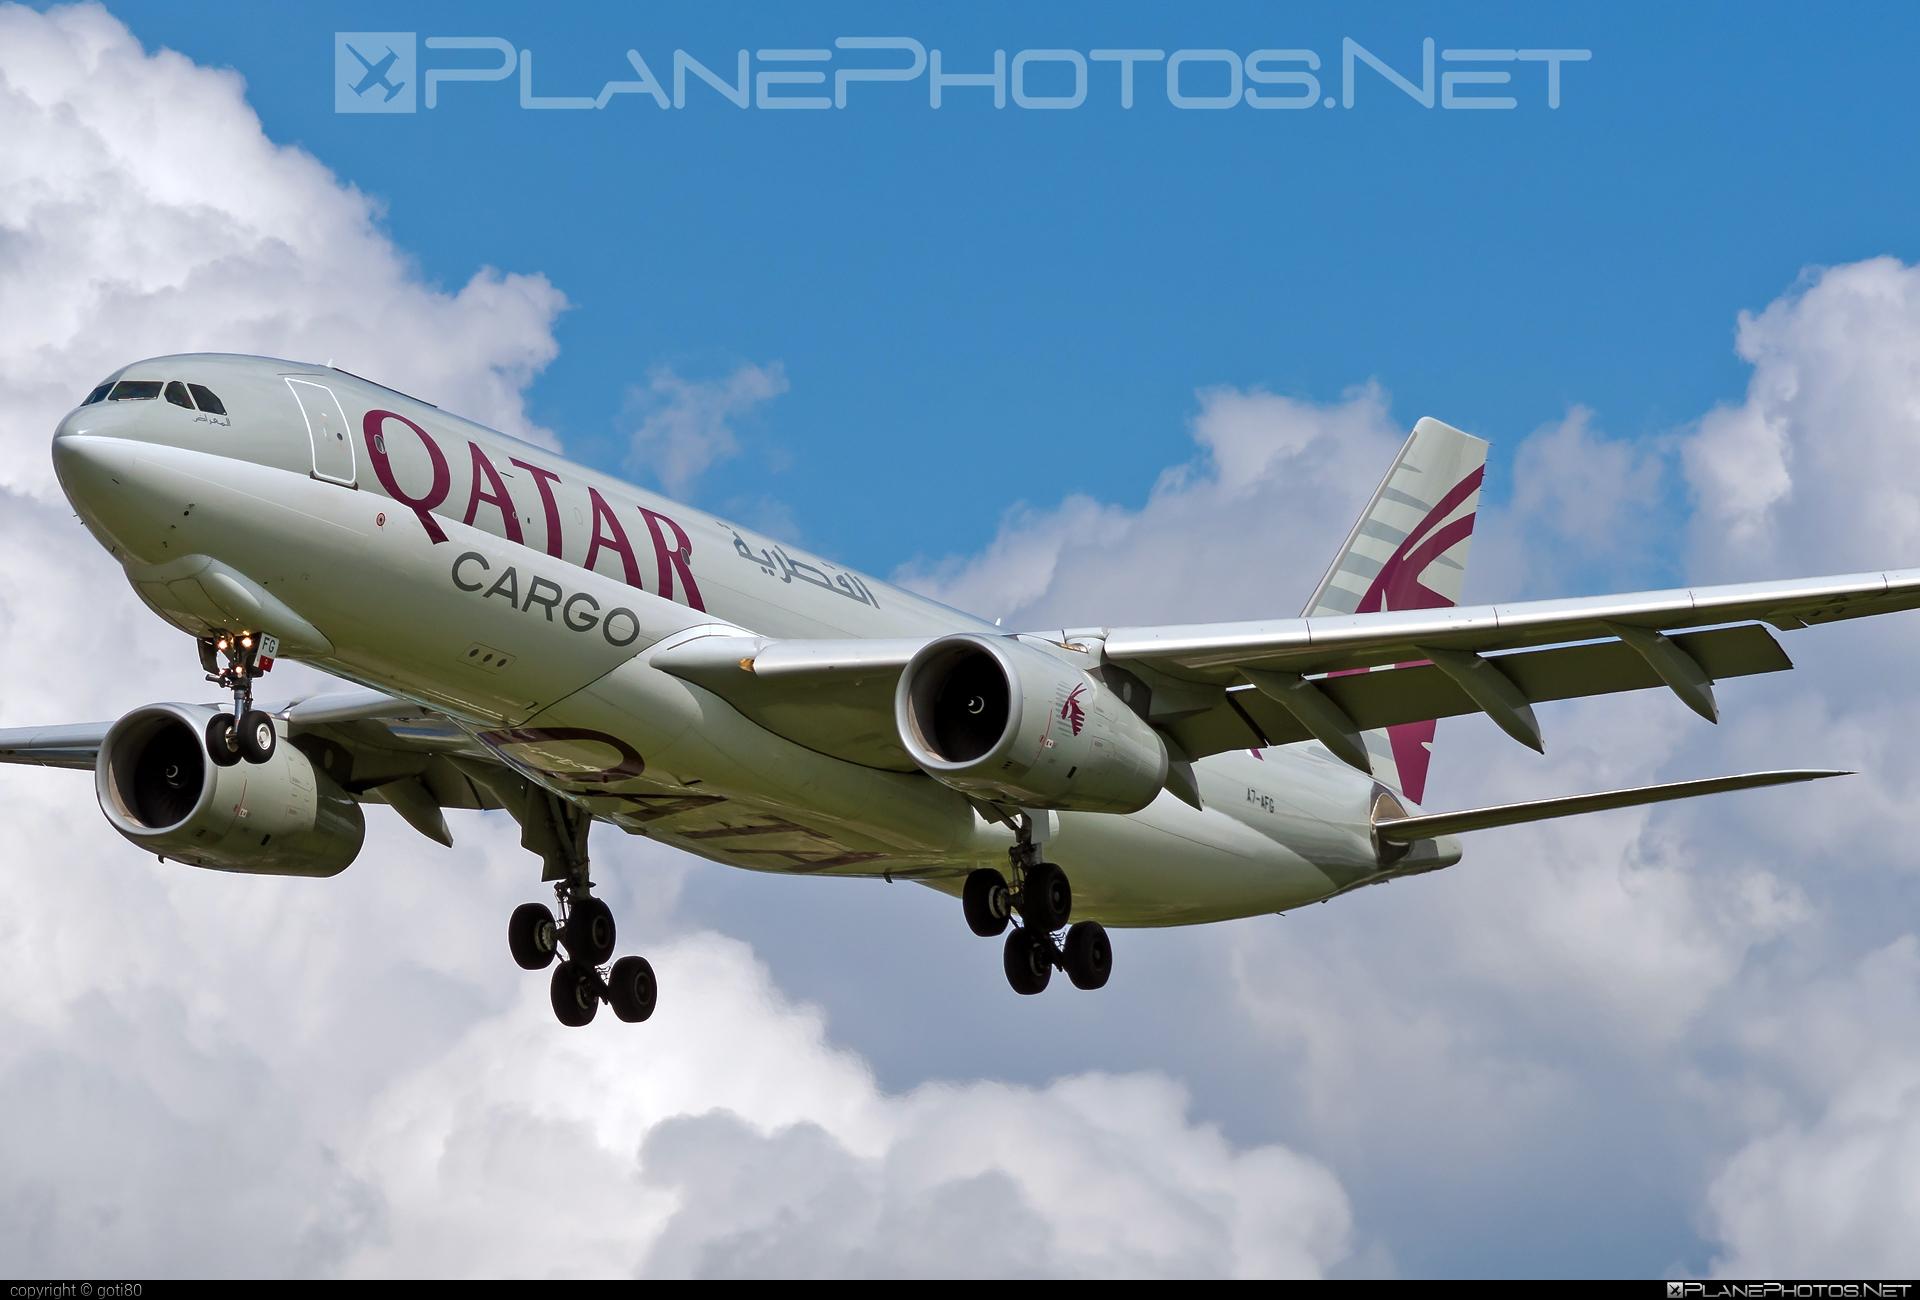 Airbus A330-243F - A7-AFG operated by Qatar Airways Cargo #a330 #a330f #a330family #airbus #airbus330 #qatarairwayscargo